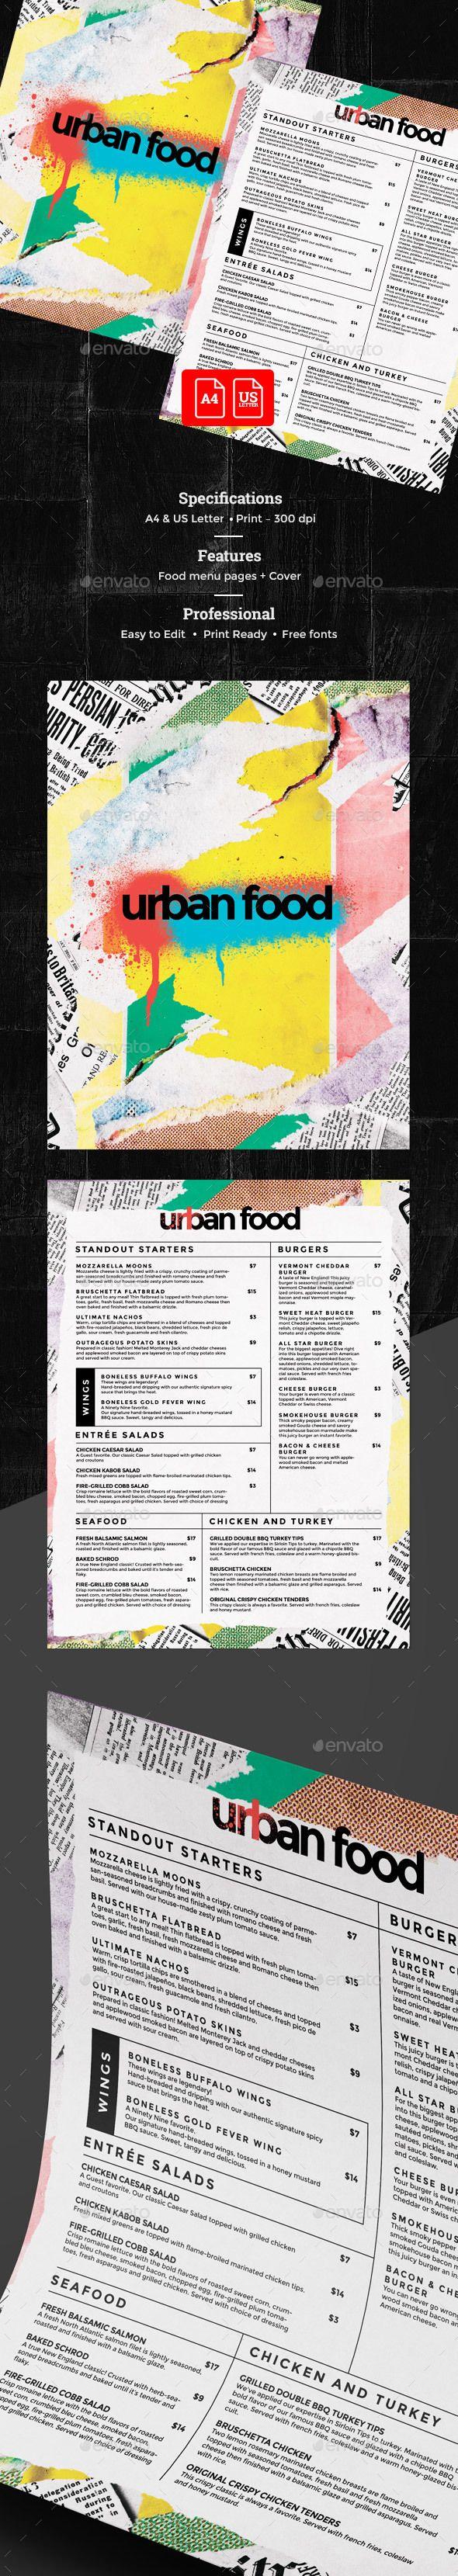 Cafe Menu — Photoshop PSD #template #cafe menu • Available here → https://graphicriver.net/item/cafe-menu/19848282?ref=pxcr